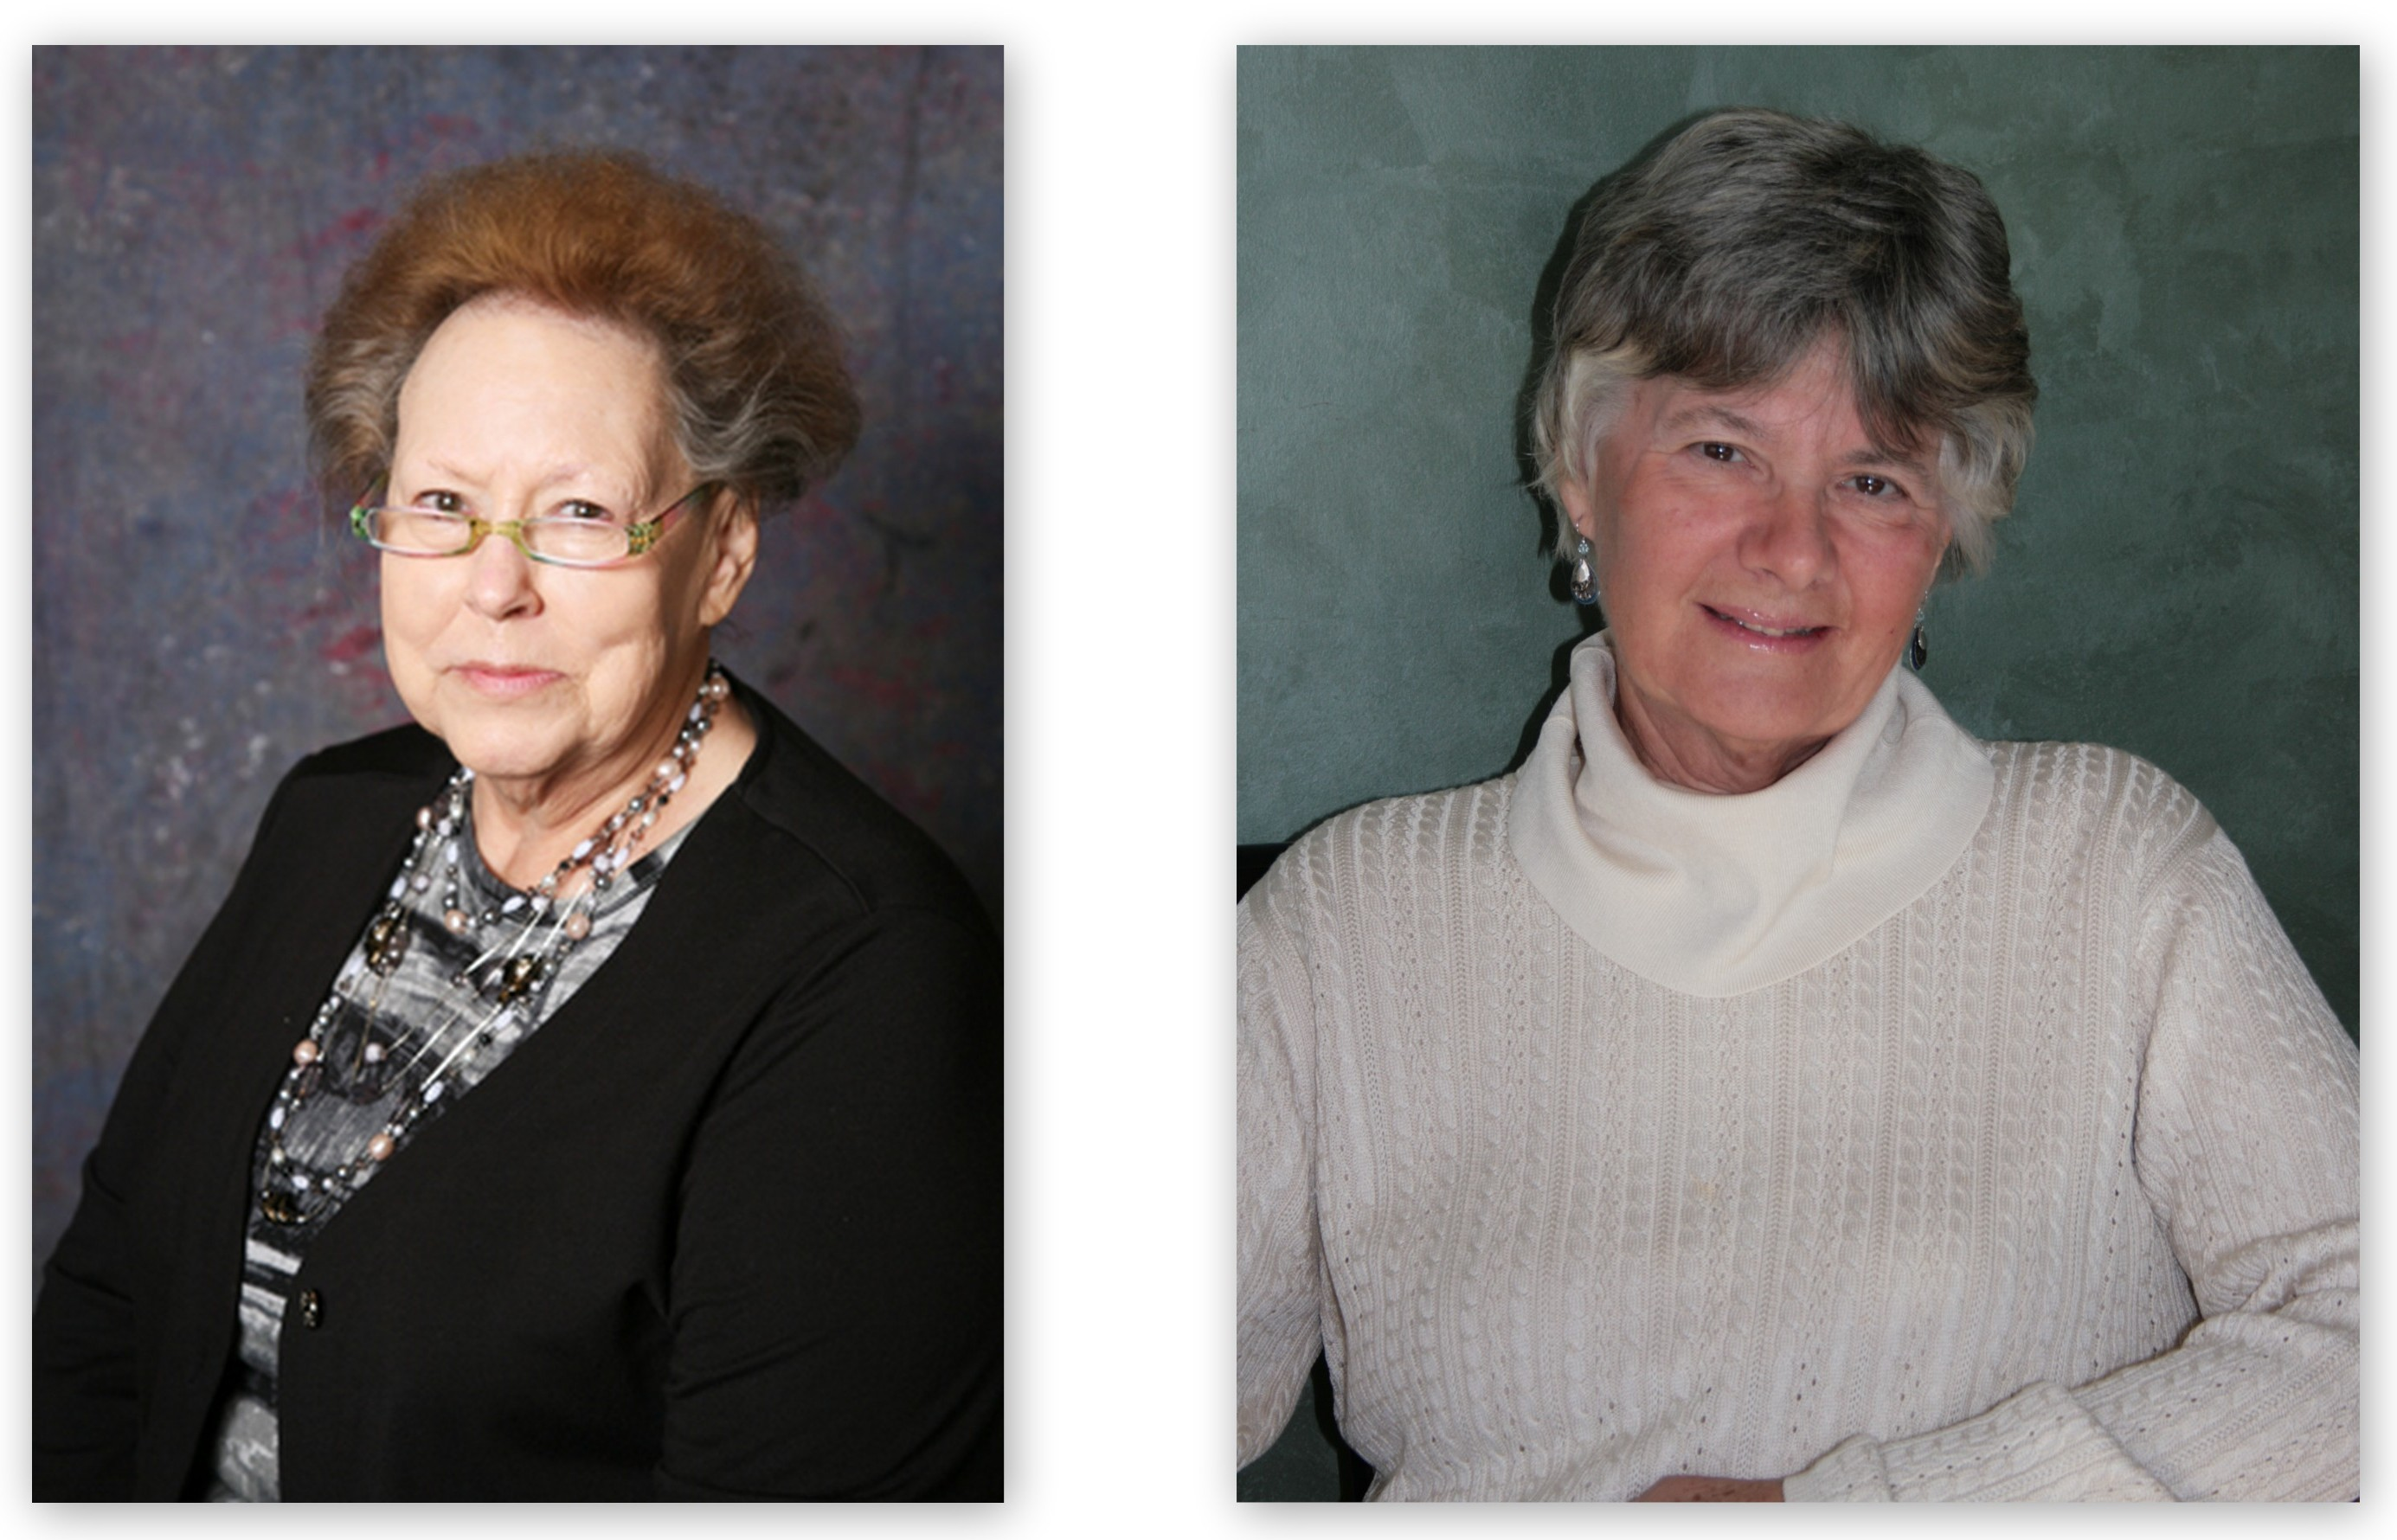 TDF's Board of Directors Selects Beth Baumert as Recipient of the Inaugural Judith Noone Volunteer Award